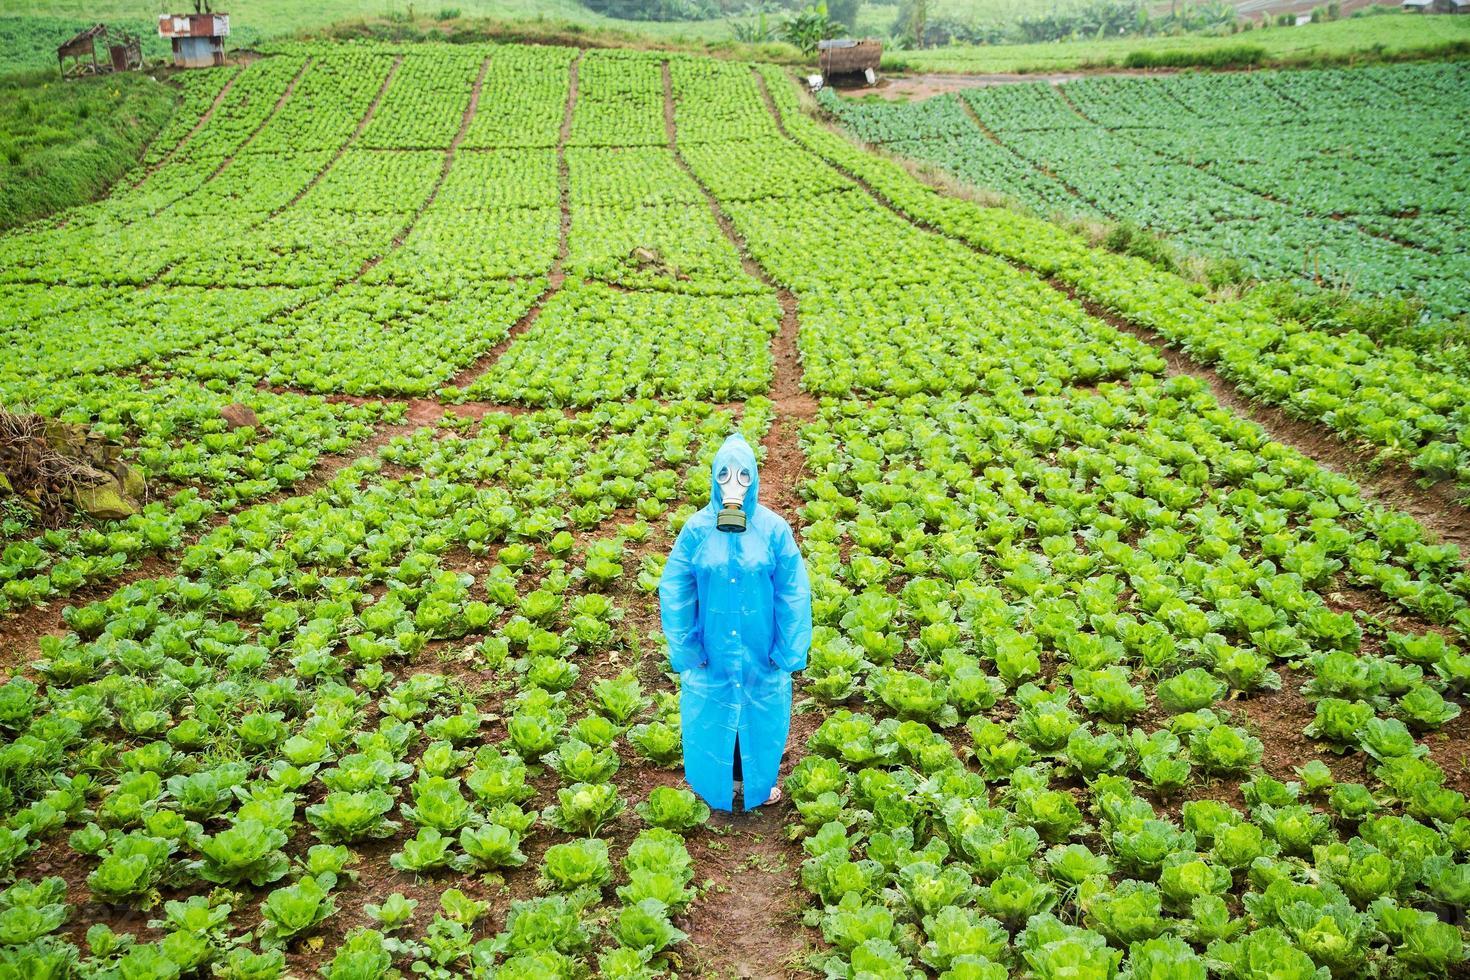 cultivar lechuga en un día lluvioso. foto